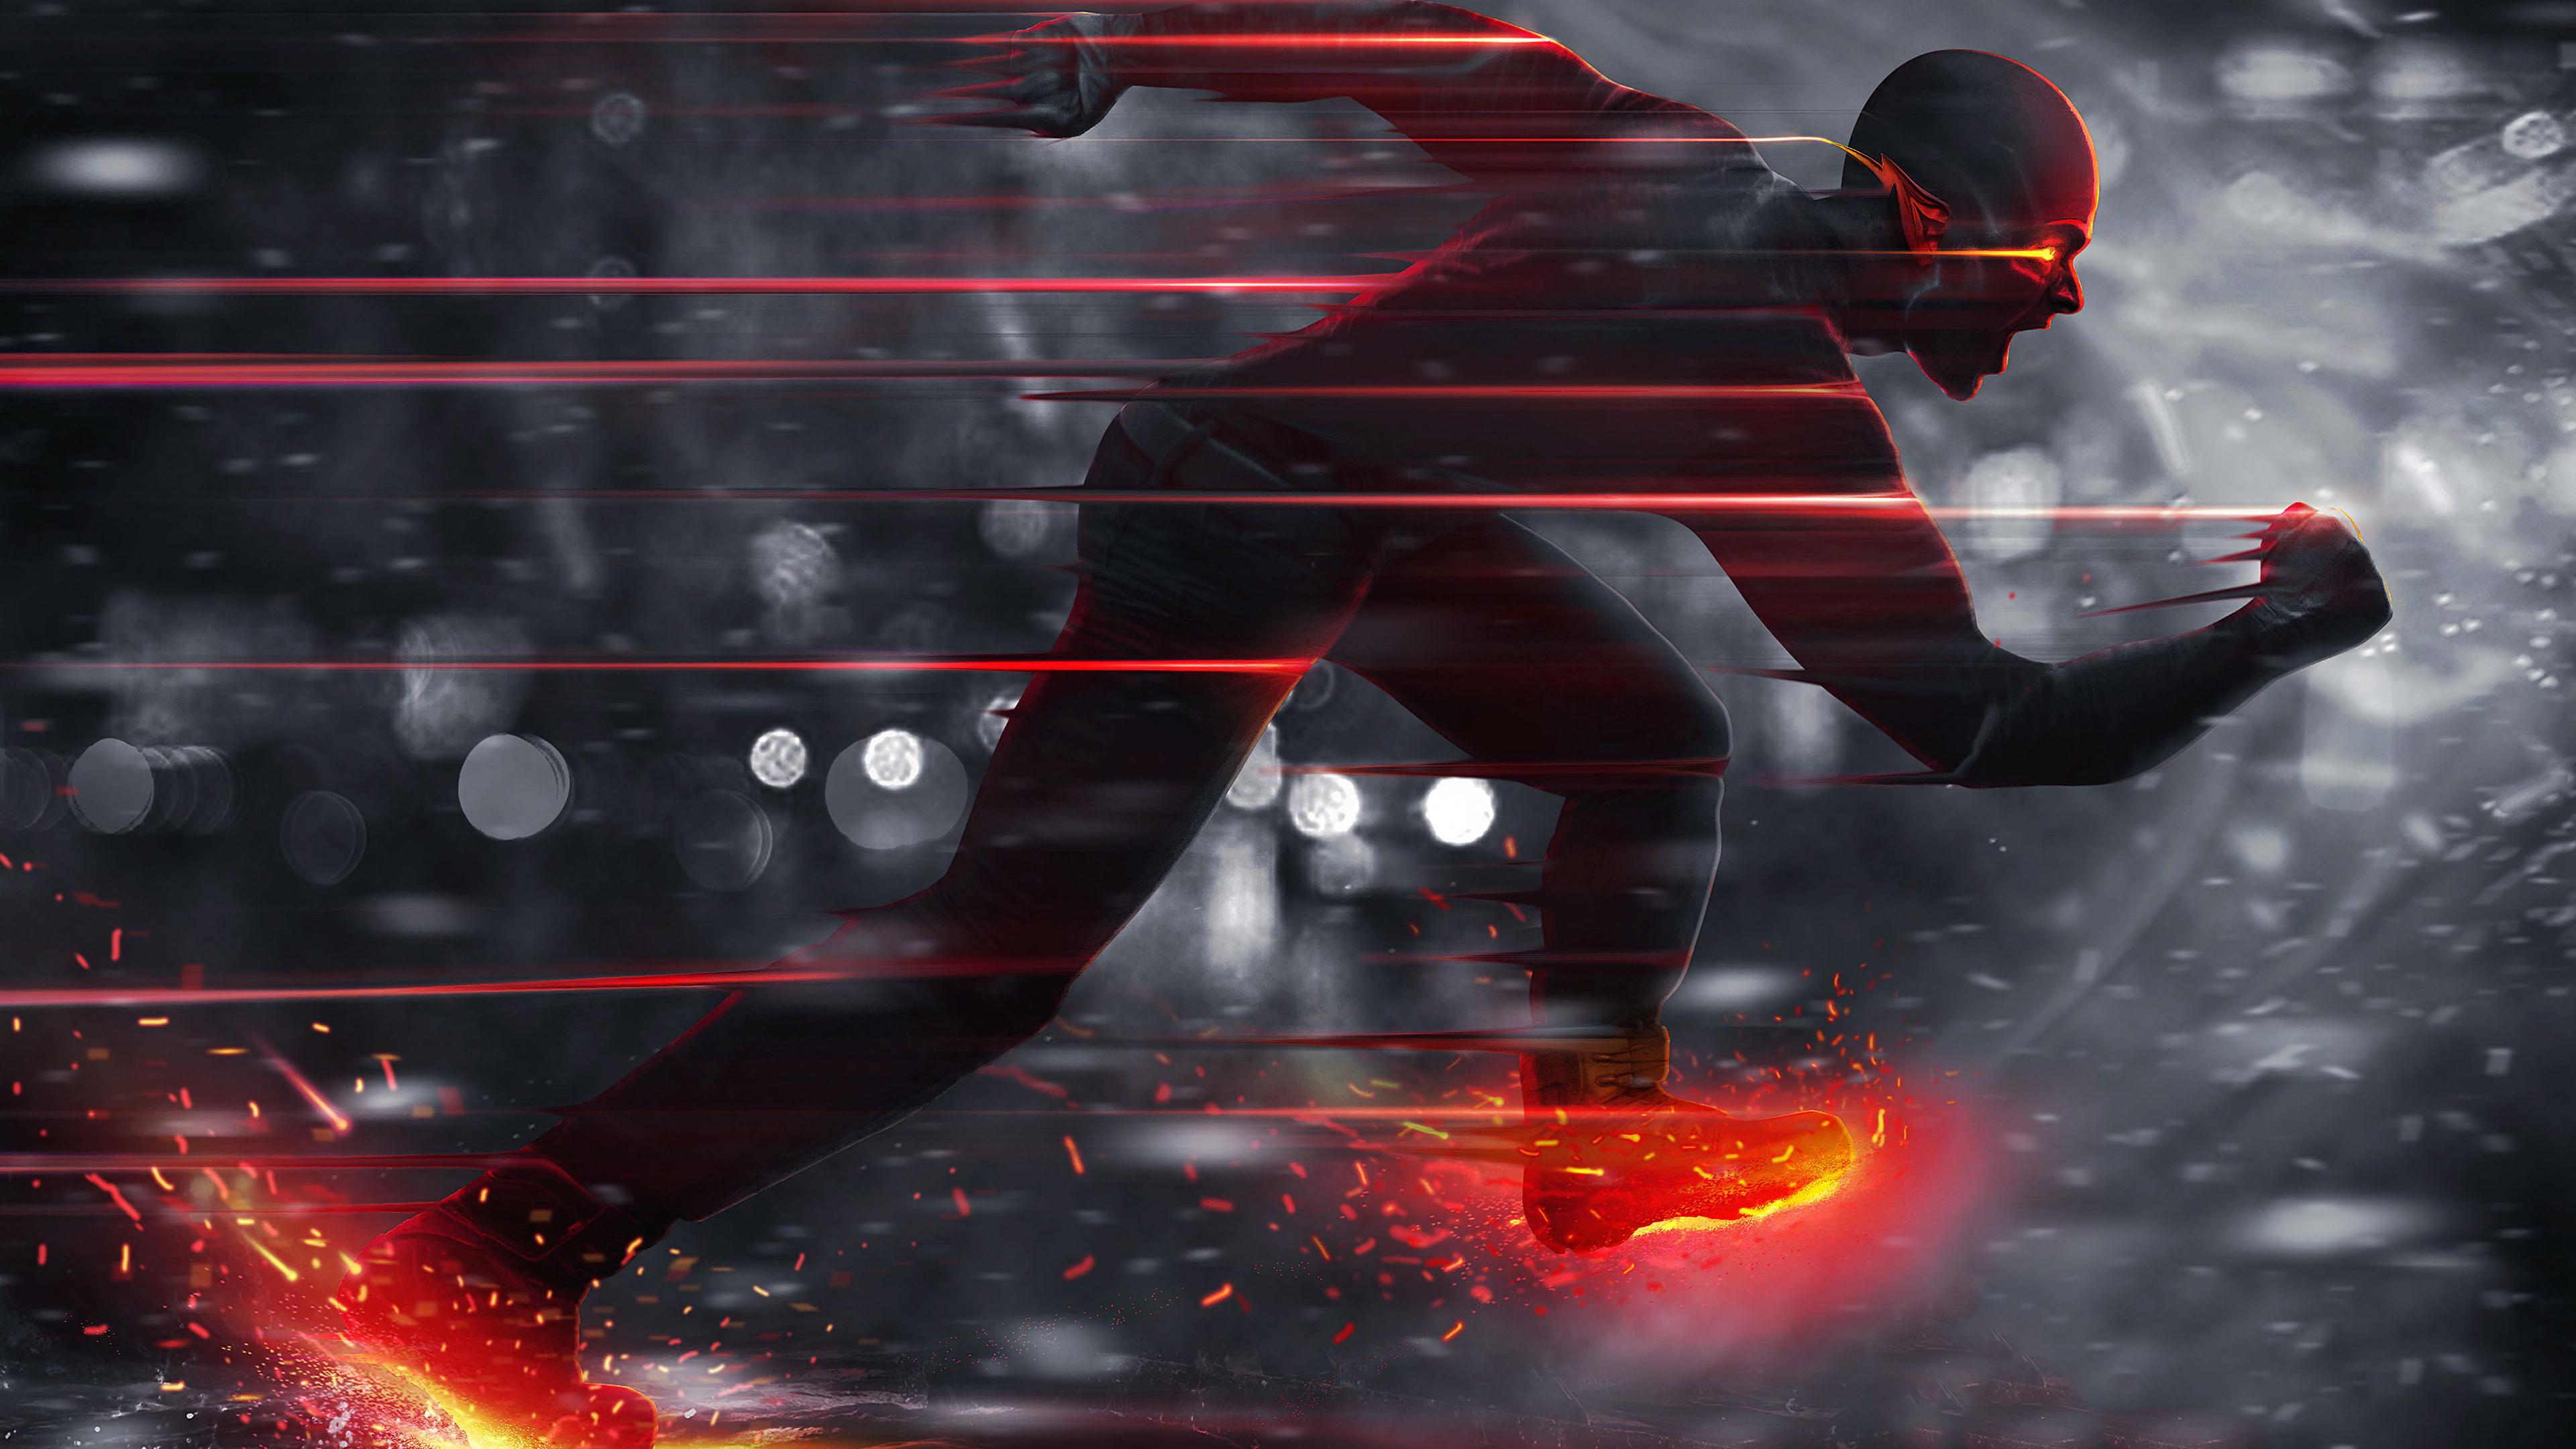 The Flash Cosplay 4k Wallpaper - Flash 4k (#112424) - HD Wallpaper &  Backgrounds Download